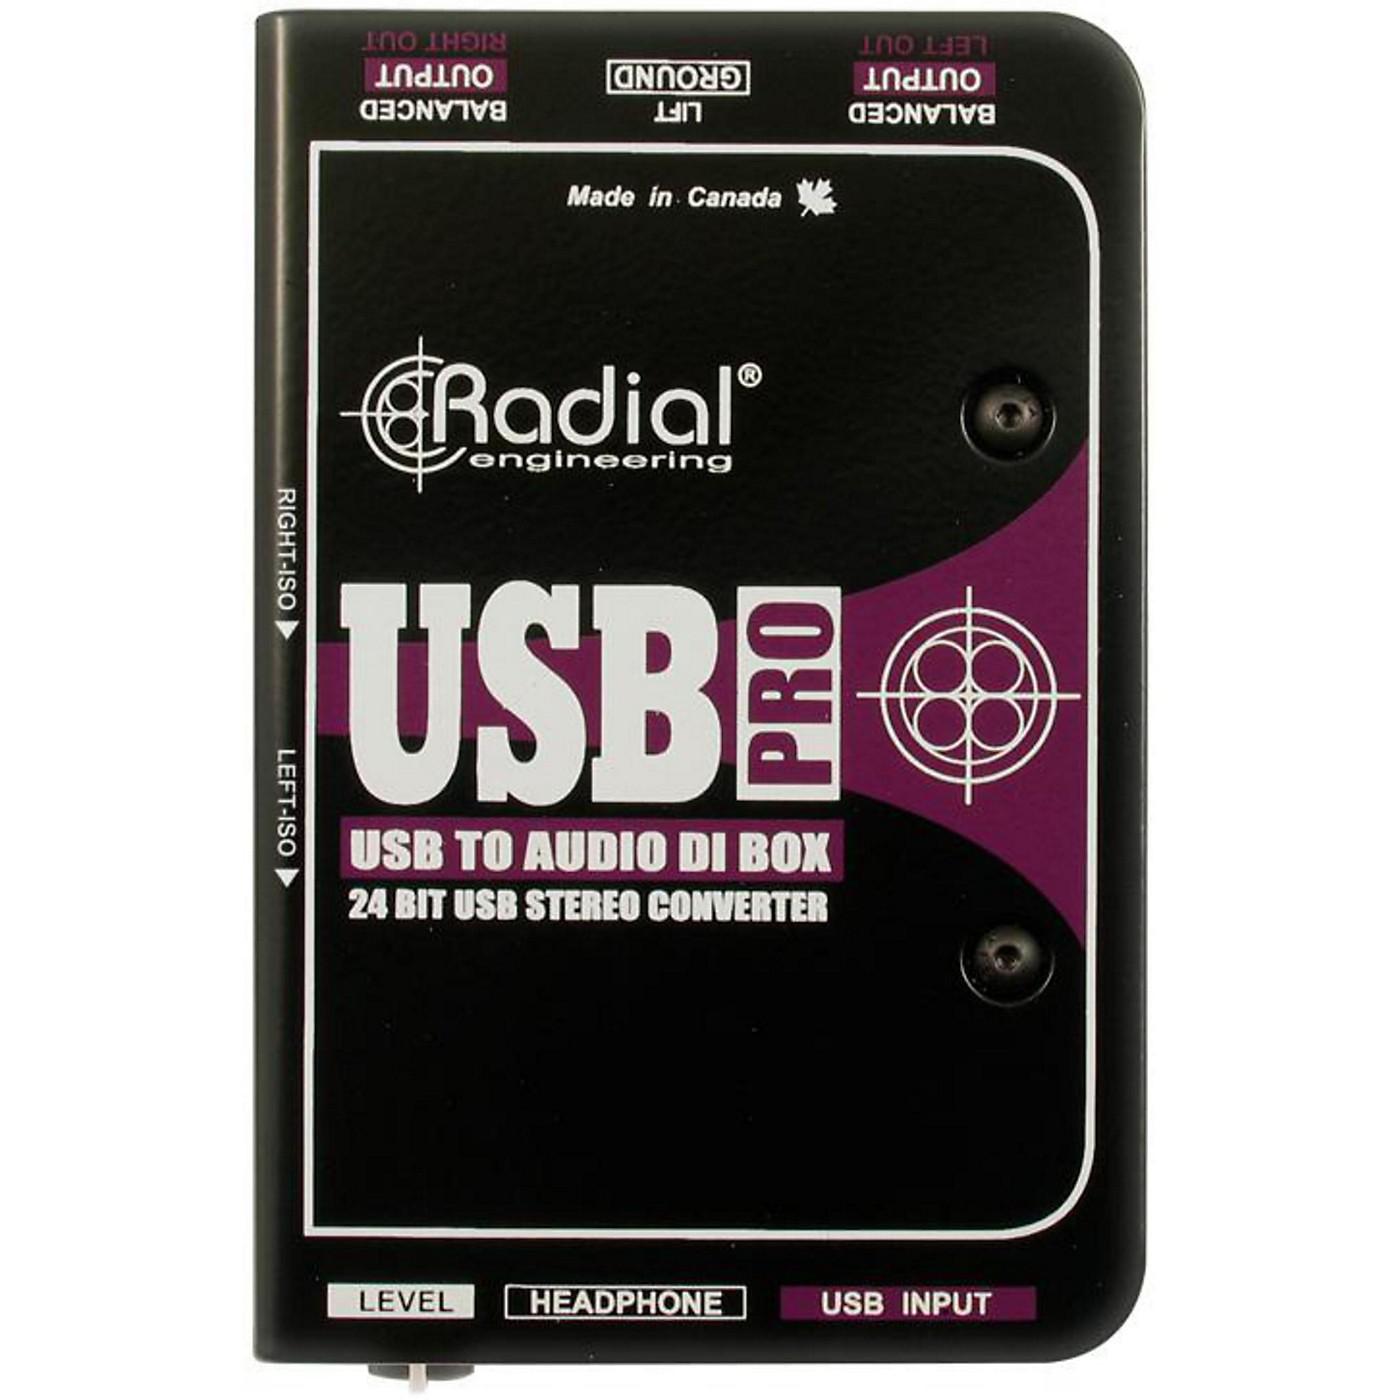 Radial Engineering USB-Pro Stereo USB Laptop DI thumbnail